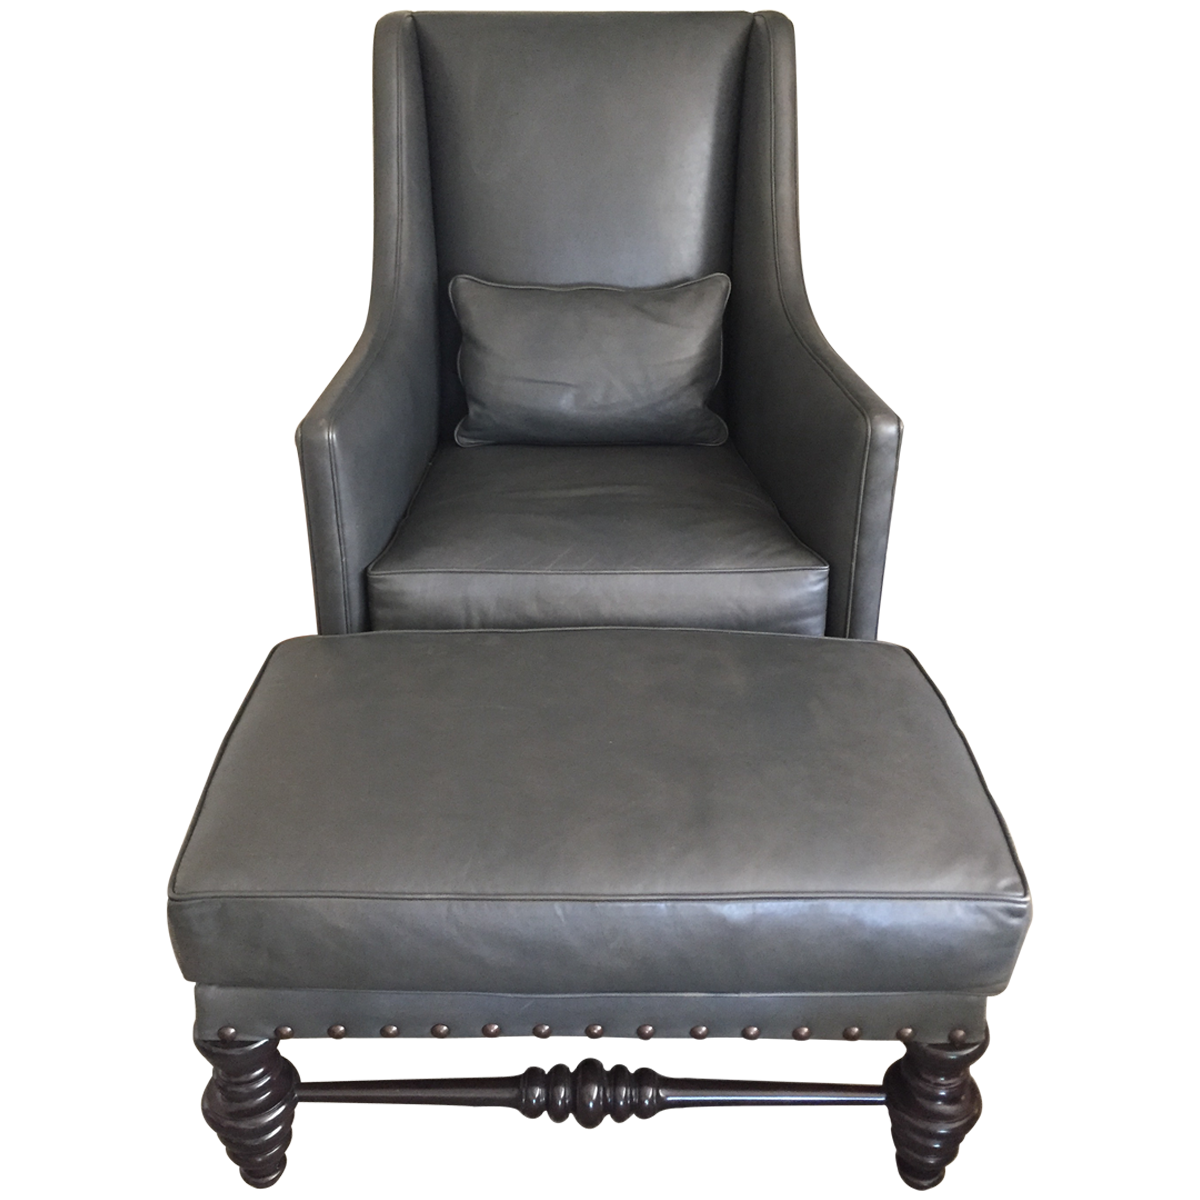 Ironies Cassis Chair & Ottoman